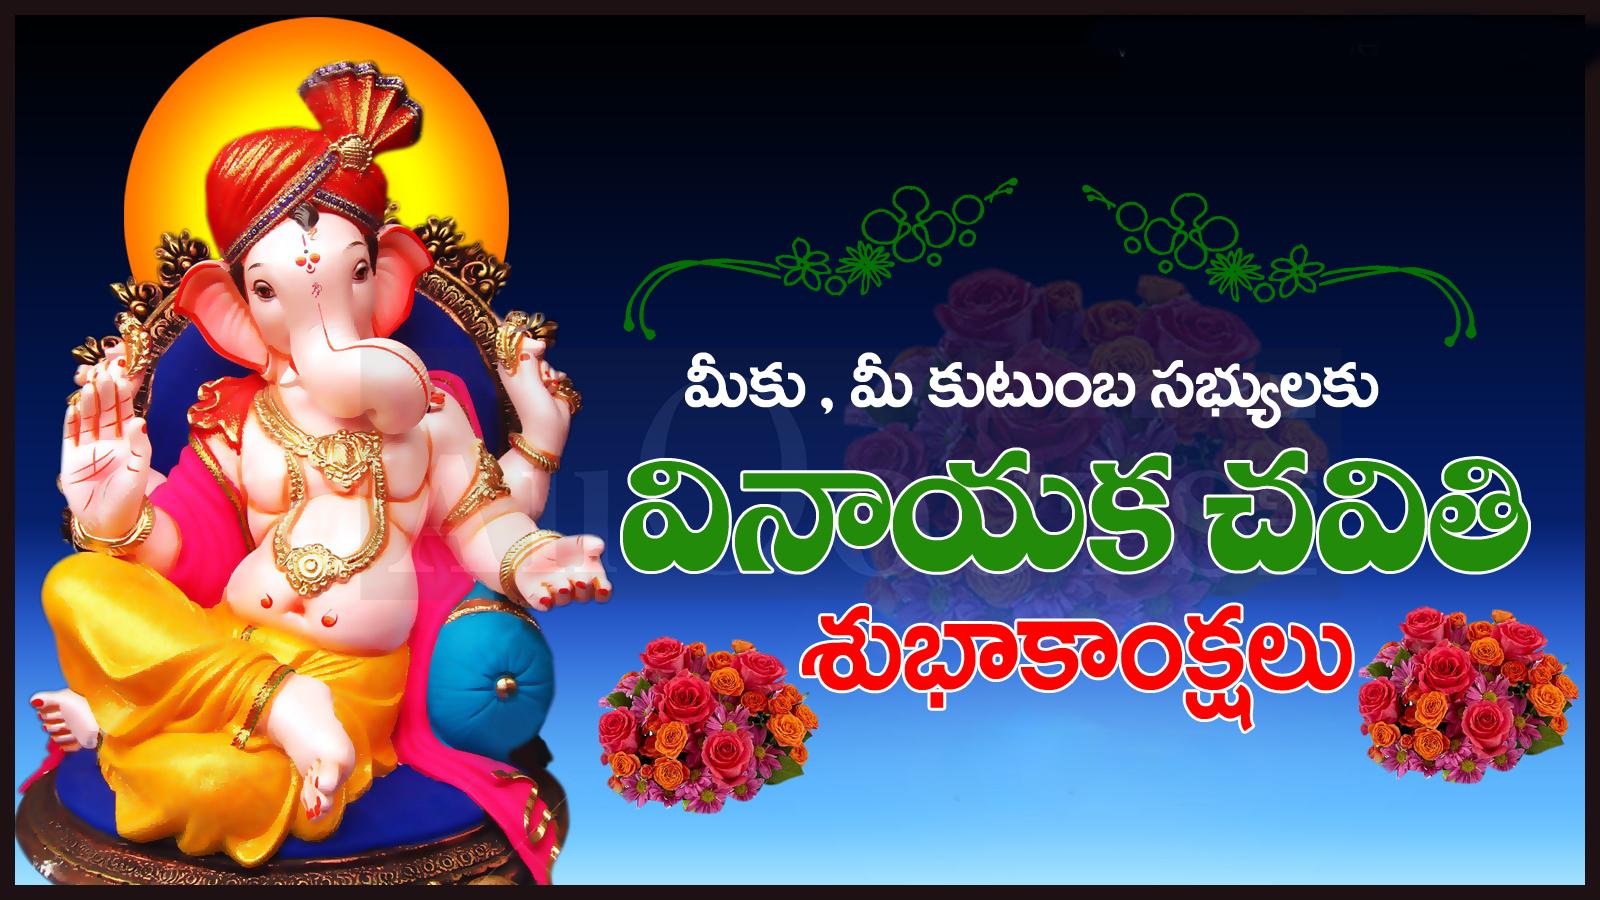 Happy vinayaka chavithi telugu greetings happy ganesh chaturthi 2015 ganesh chaturthi widely celebrated in andhrapradesh karnatakavinayaka chavithi quotes in telugu greetings in m4hsunfo Gallery